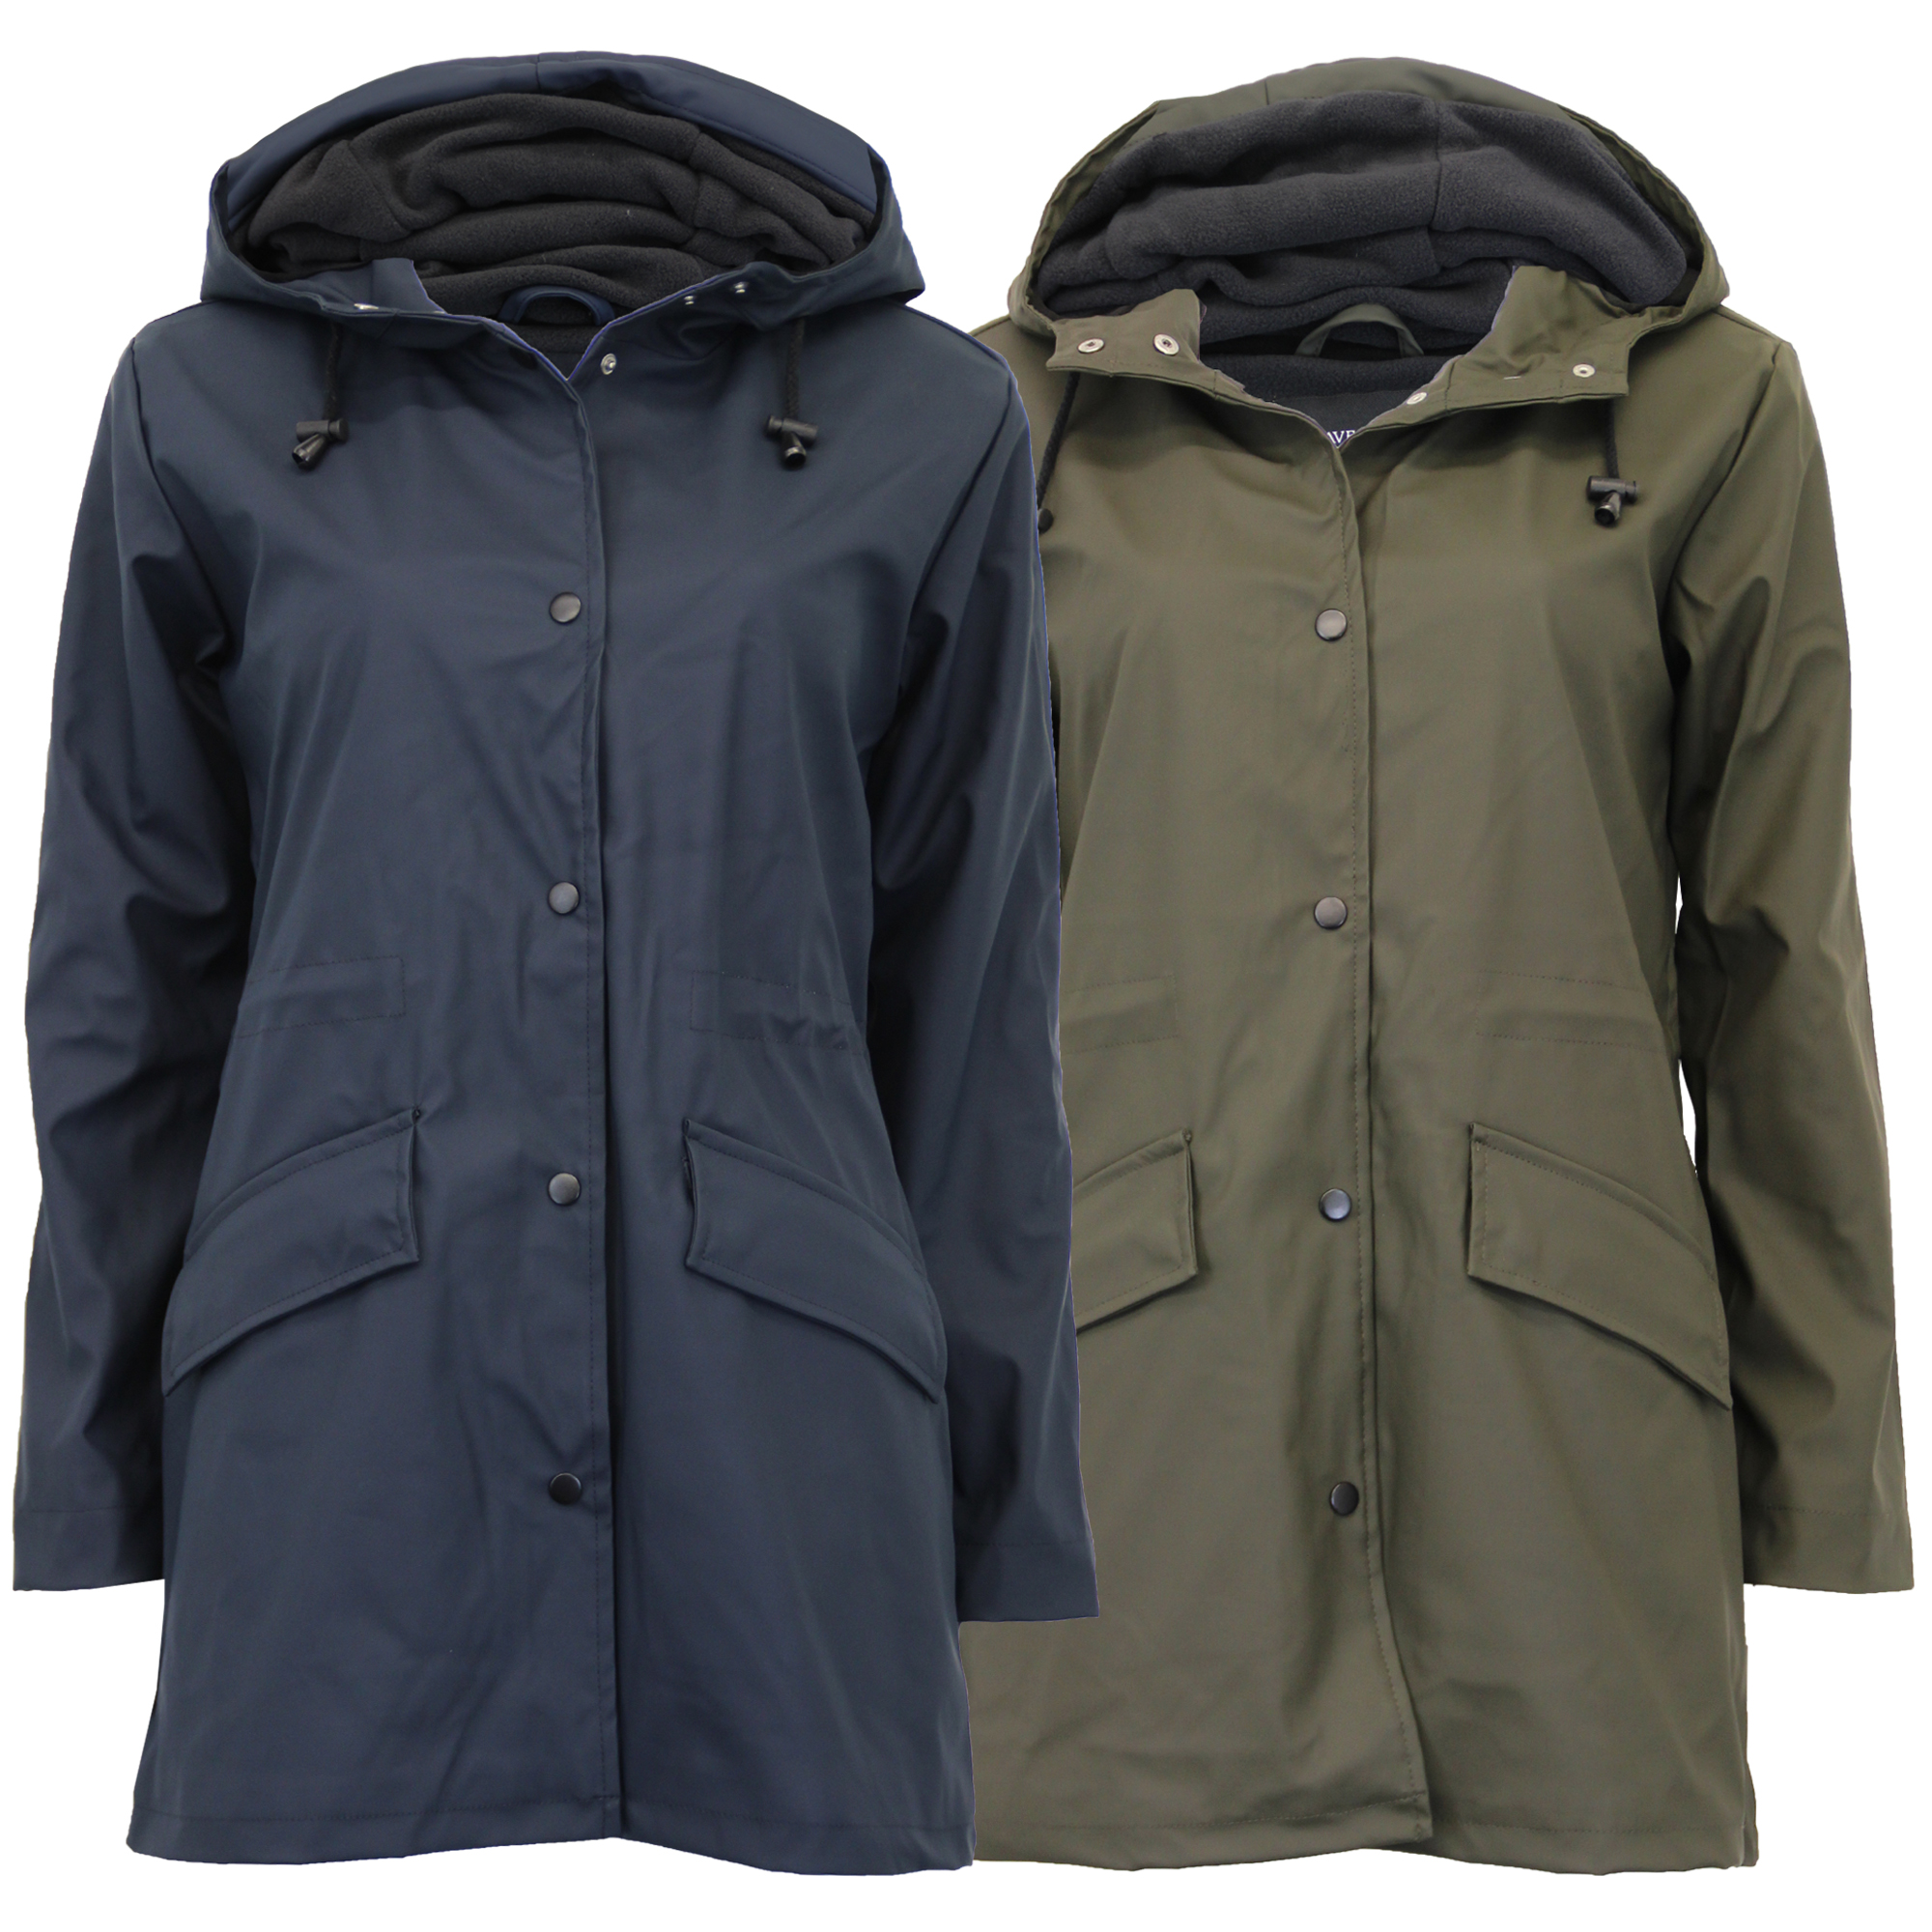 abf5f034f Details about Ladies Rain Coat Brave Soul Womens PU PVC Long Hoodie Jacket  Fleece Lined Winter